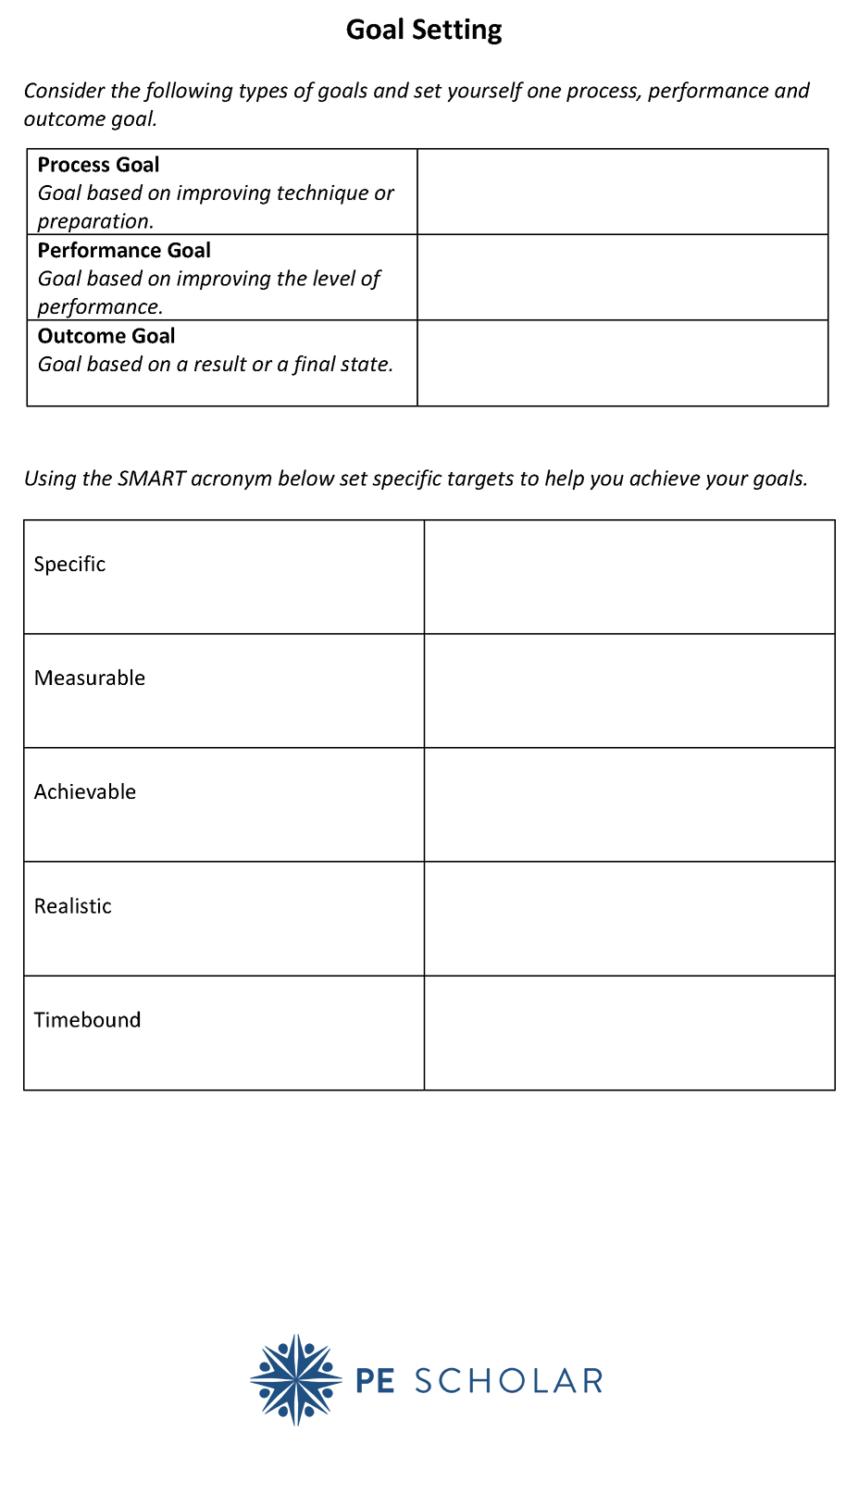 Goal Setting Worksheet Goal setting worksheet, Goal